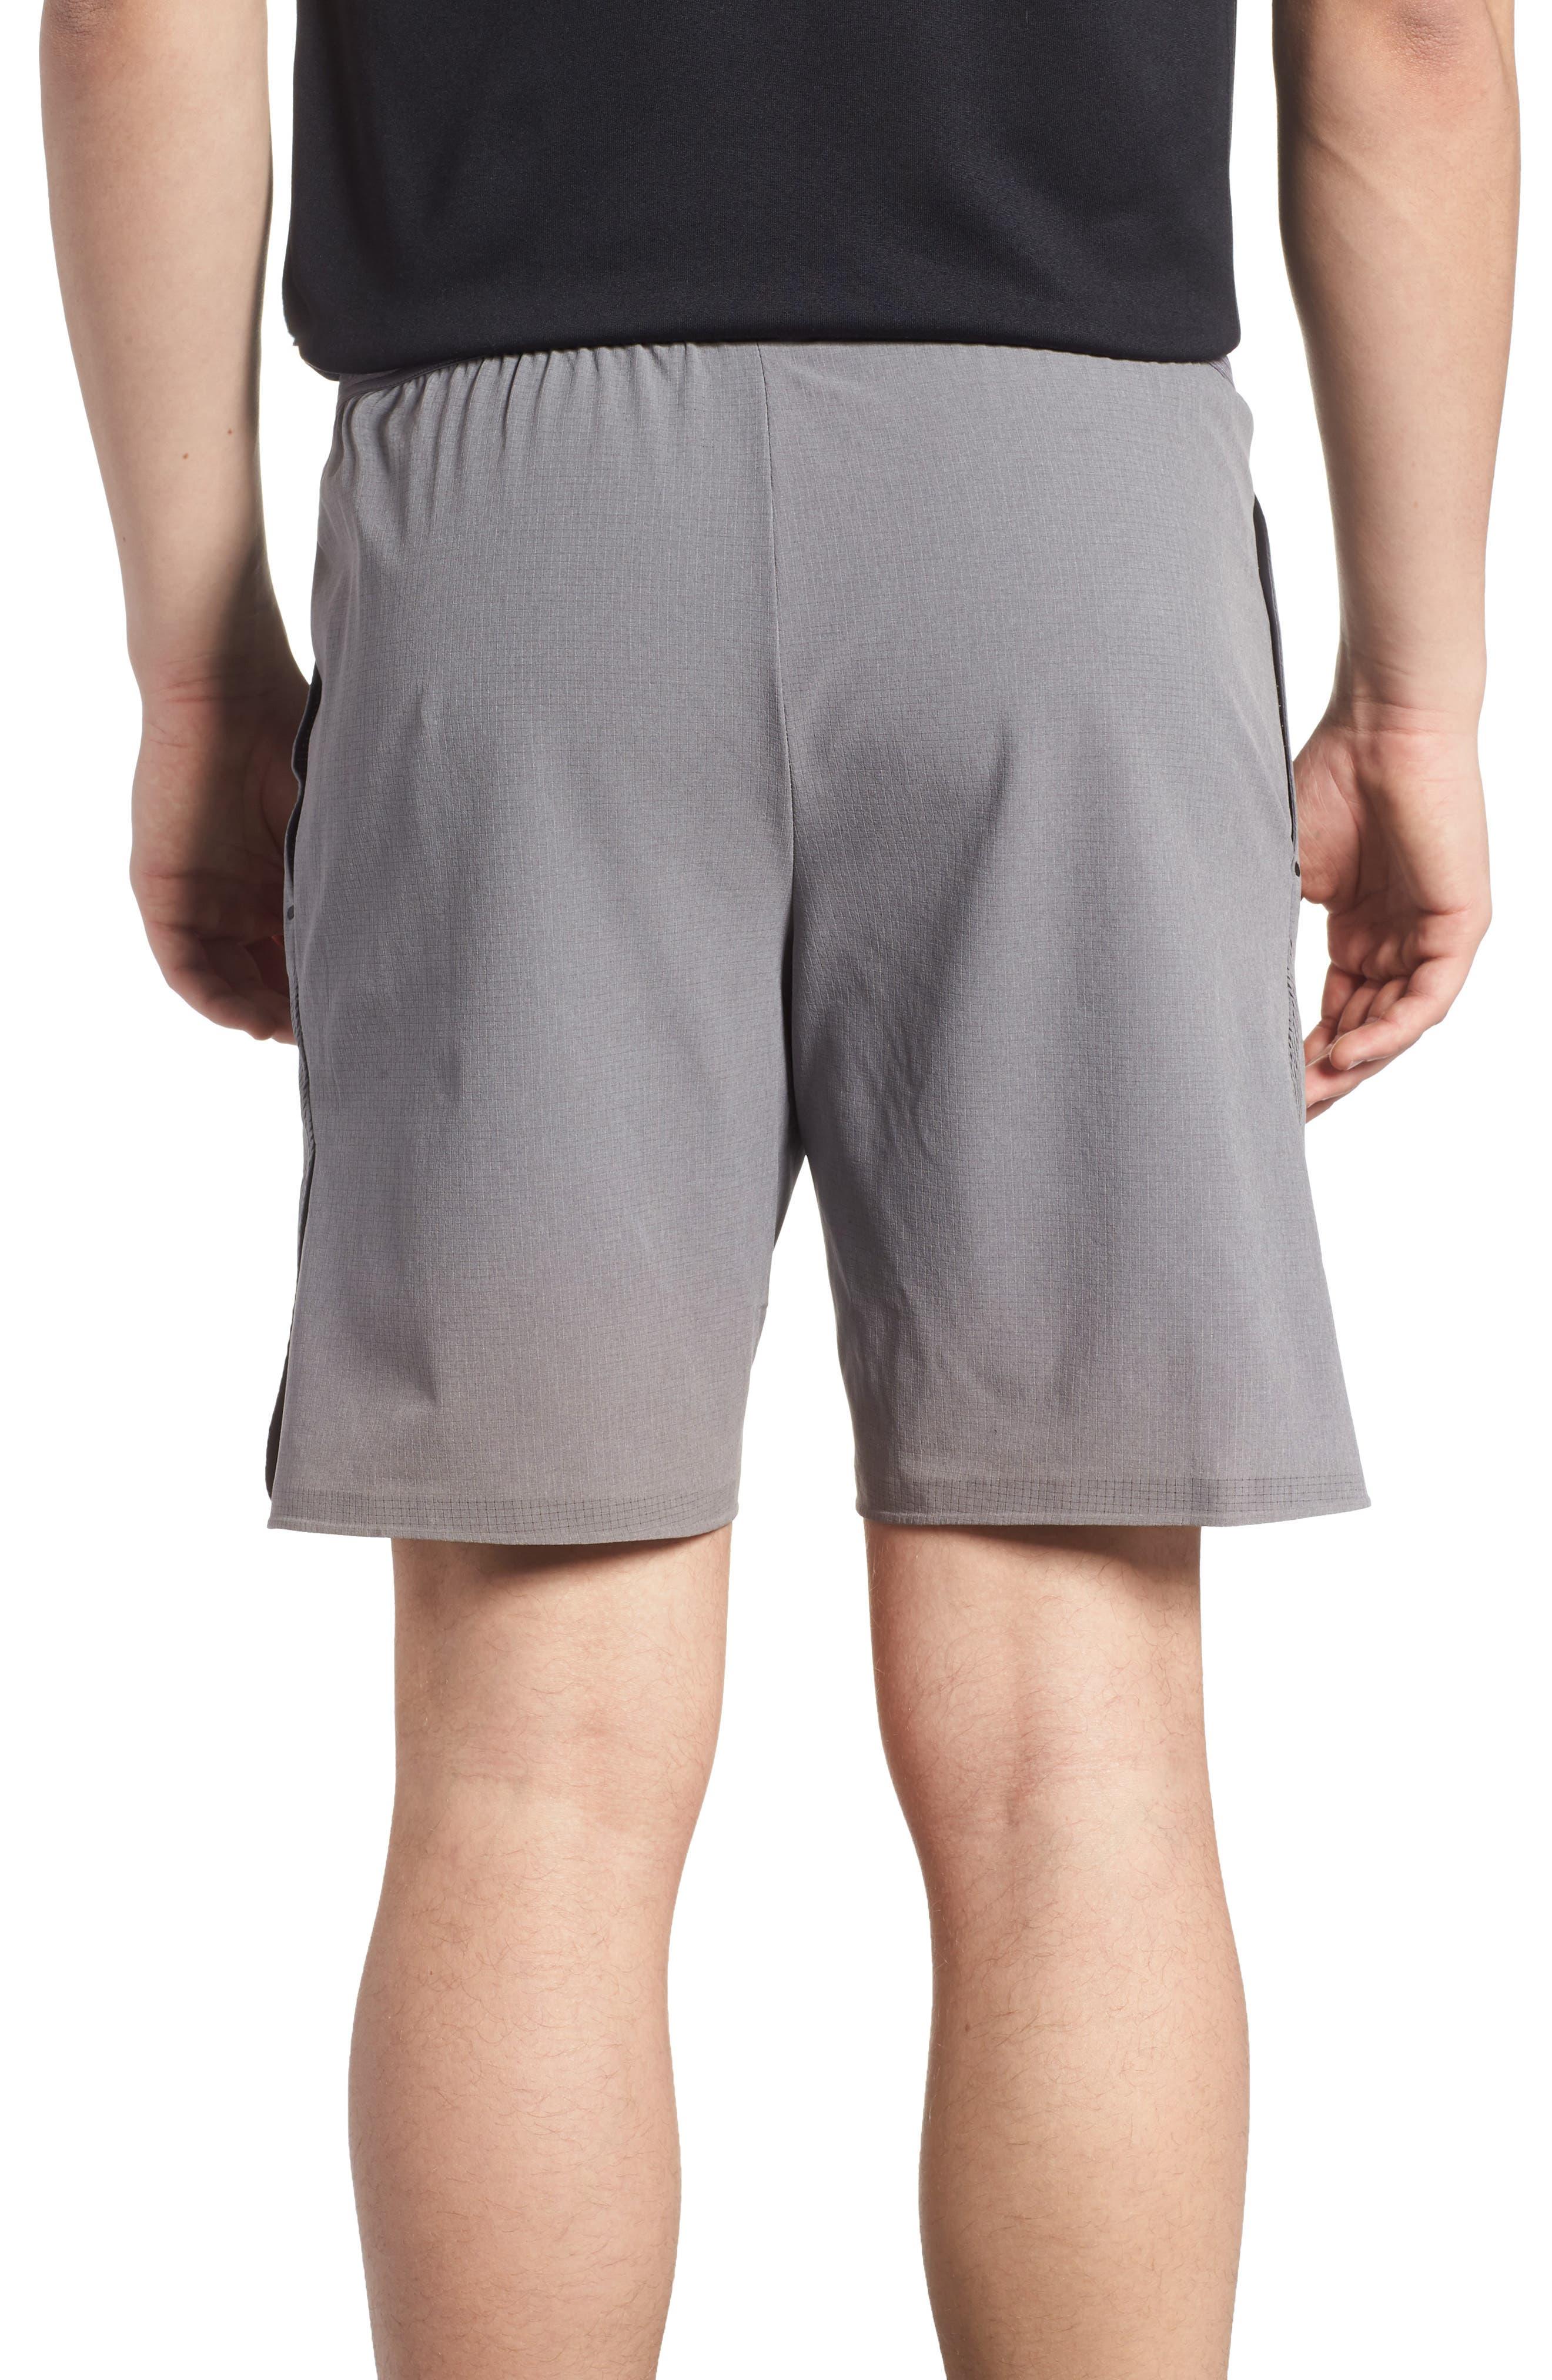 Repel 3.0 Flex Training Shorts,                             Alternate thumbnail 2, color,                             Gun Smoke/ Grey/ Black